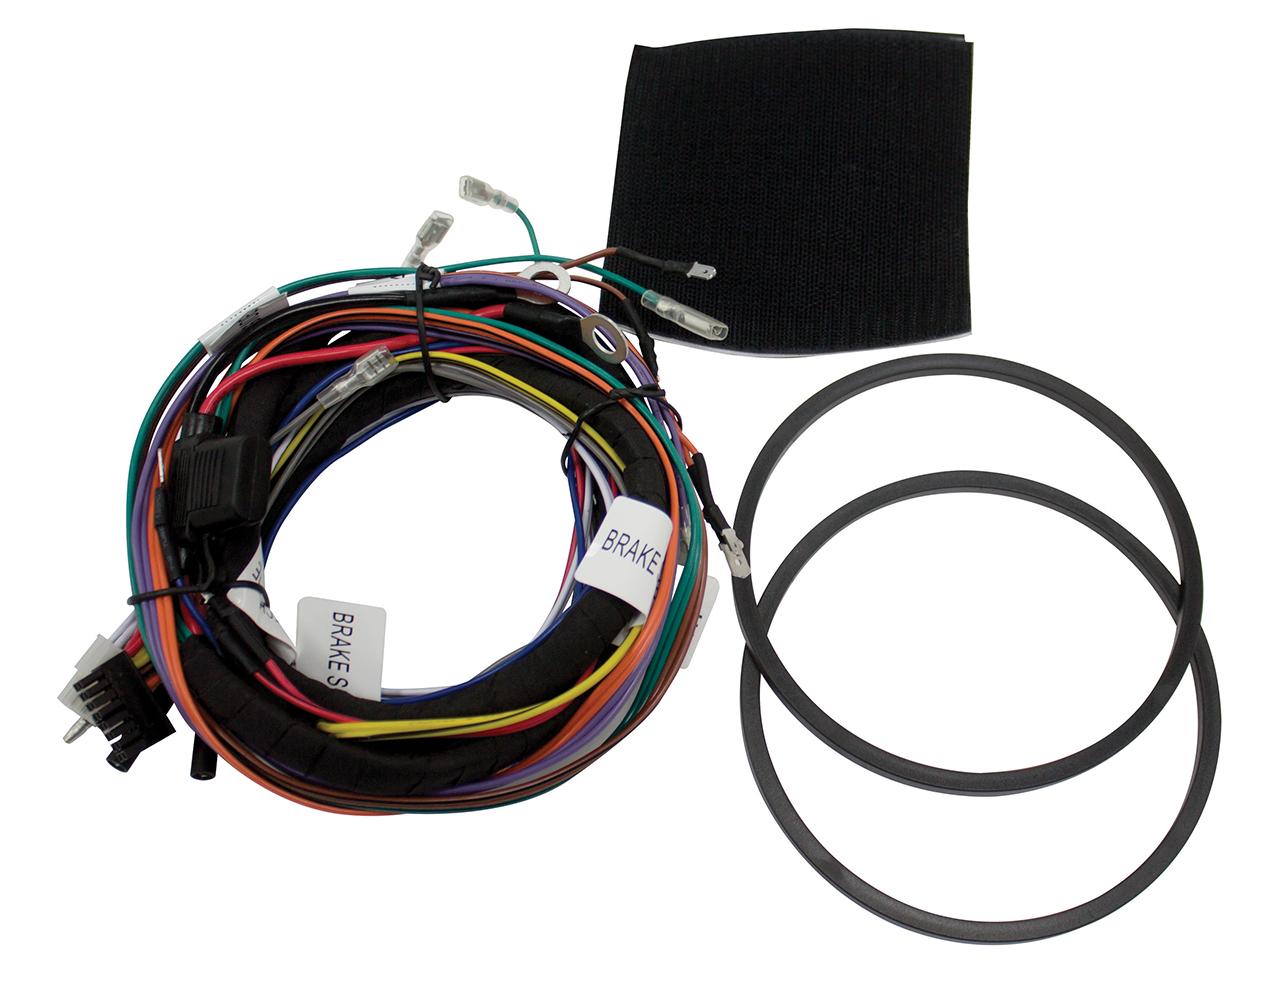 harley tour pack speakers wiring harness harley trunk